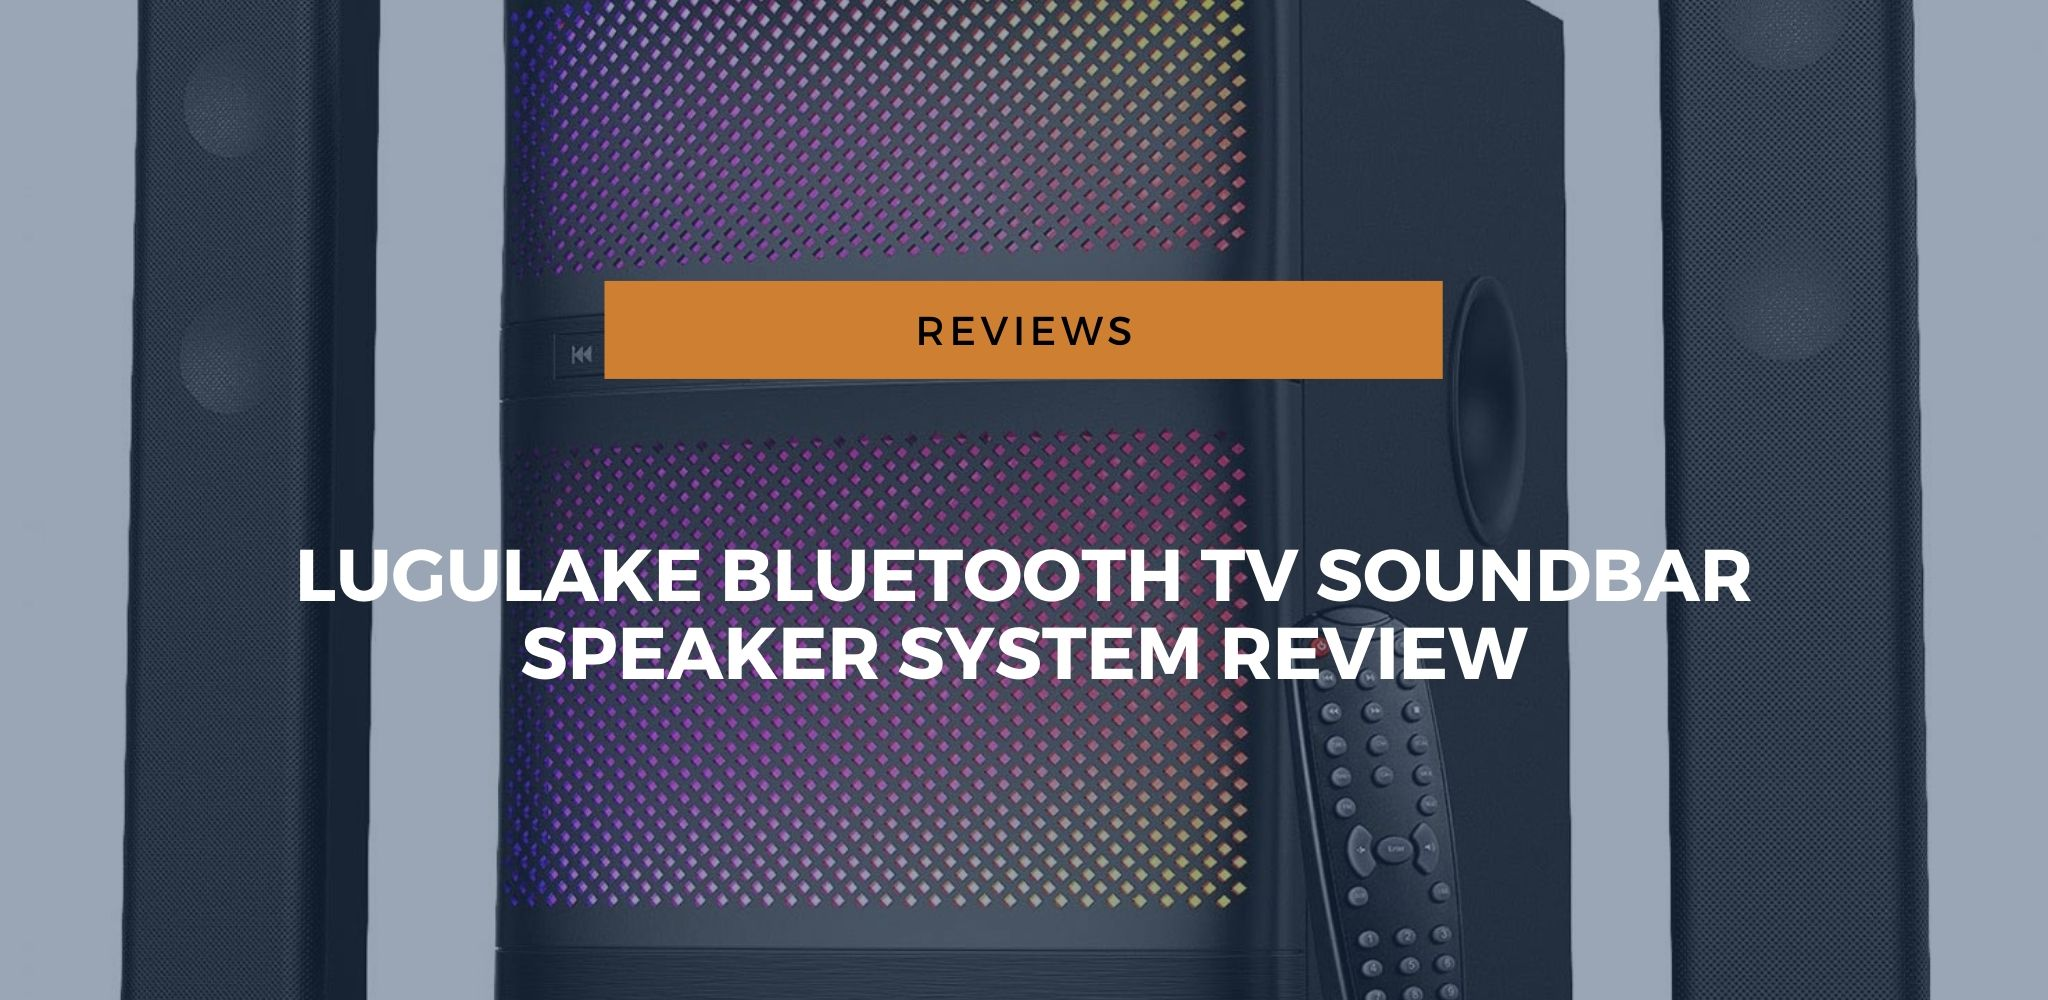 lugulake bluetooth tv soundbar speaker system review